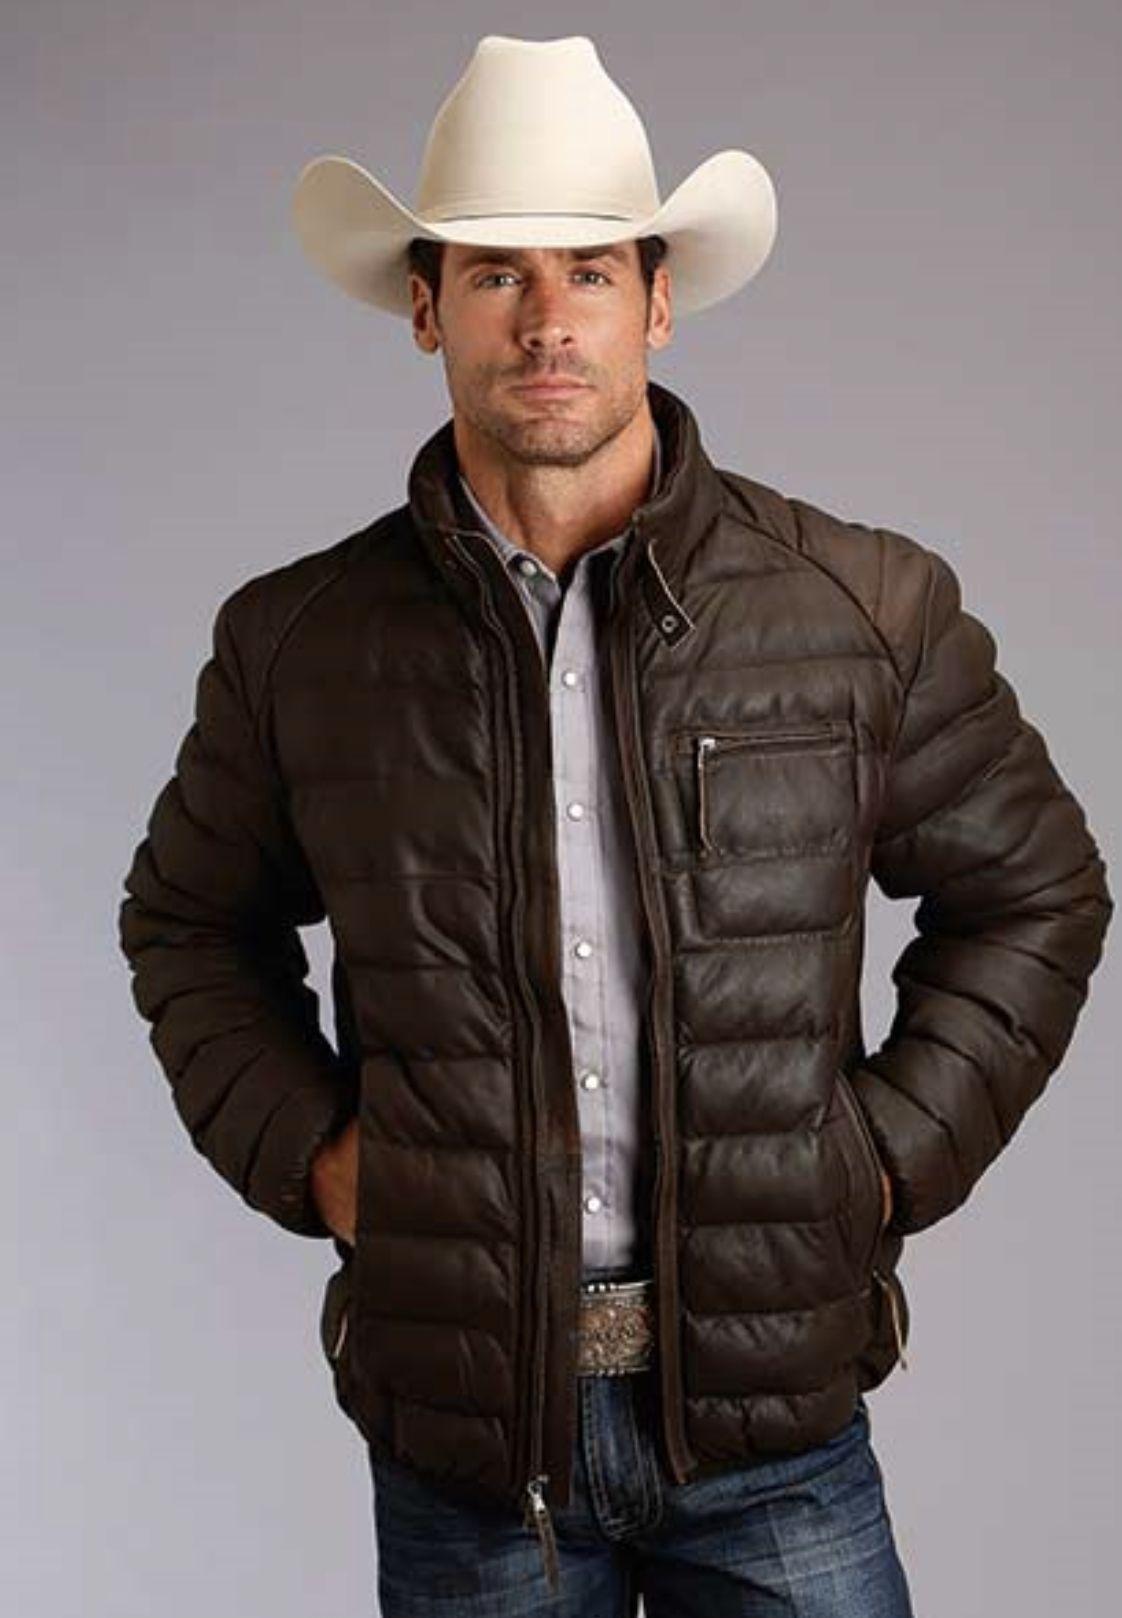 Pin On Cowboy Clothing [ 1618 x 1122 Pixel ]